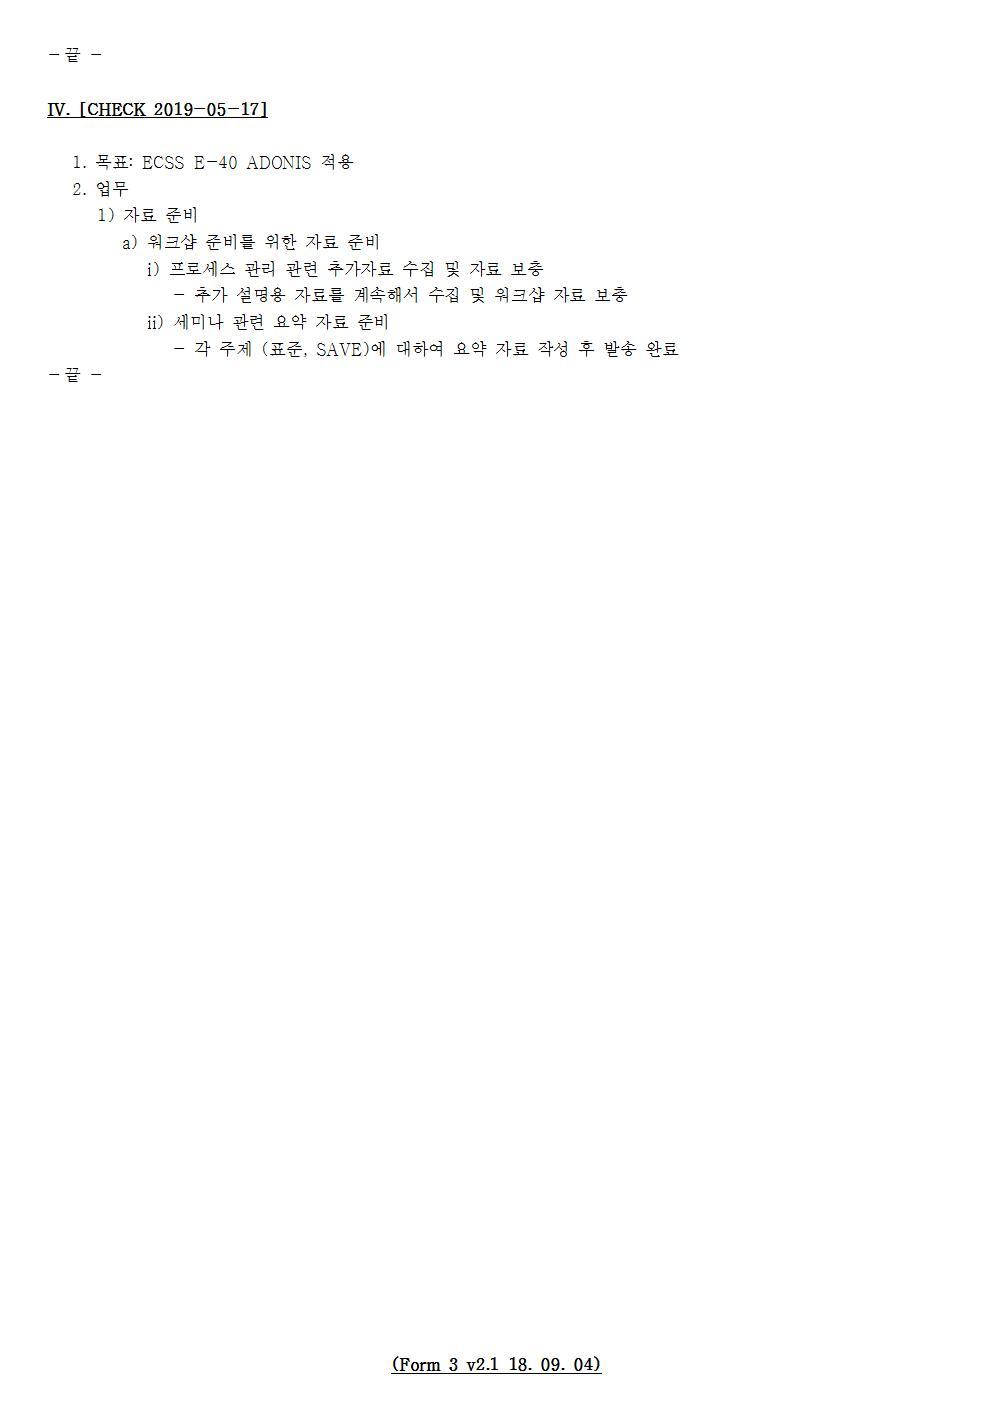 D-[19-004-RD-04]-[CMS]-[2019-05-17][YB]-[P+D+C]002.jpg